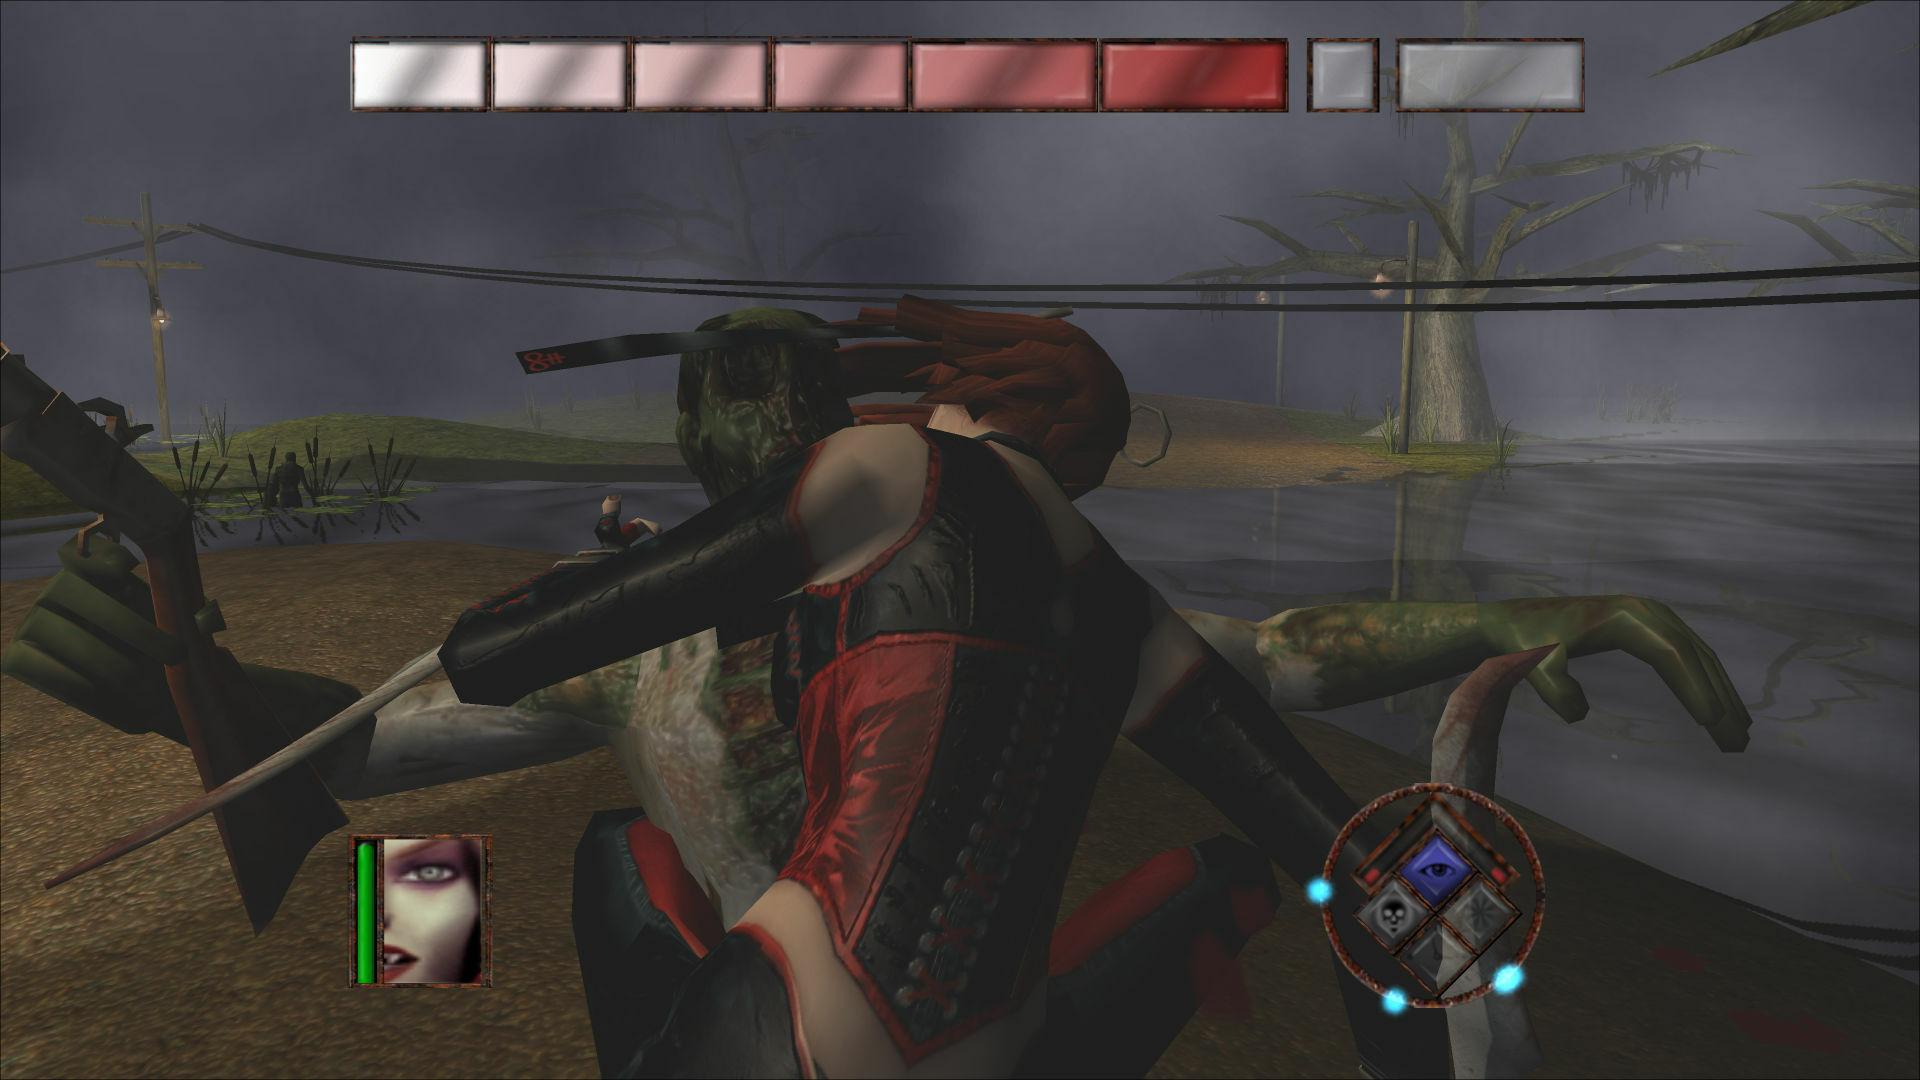 BloodRayne: Terminal Cut screenshot 2